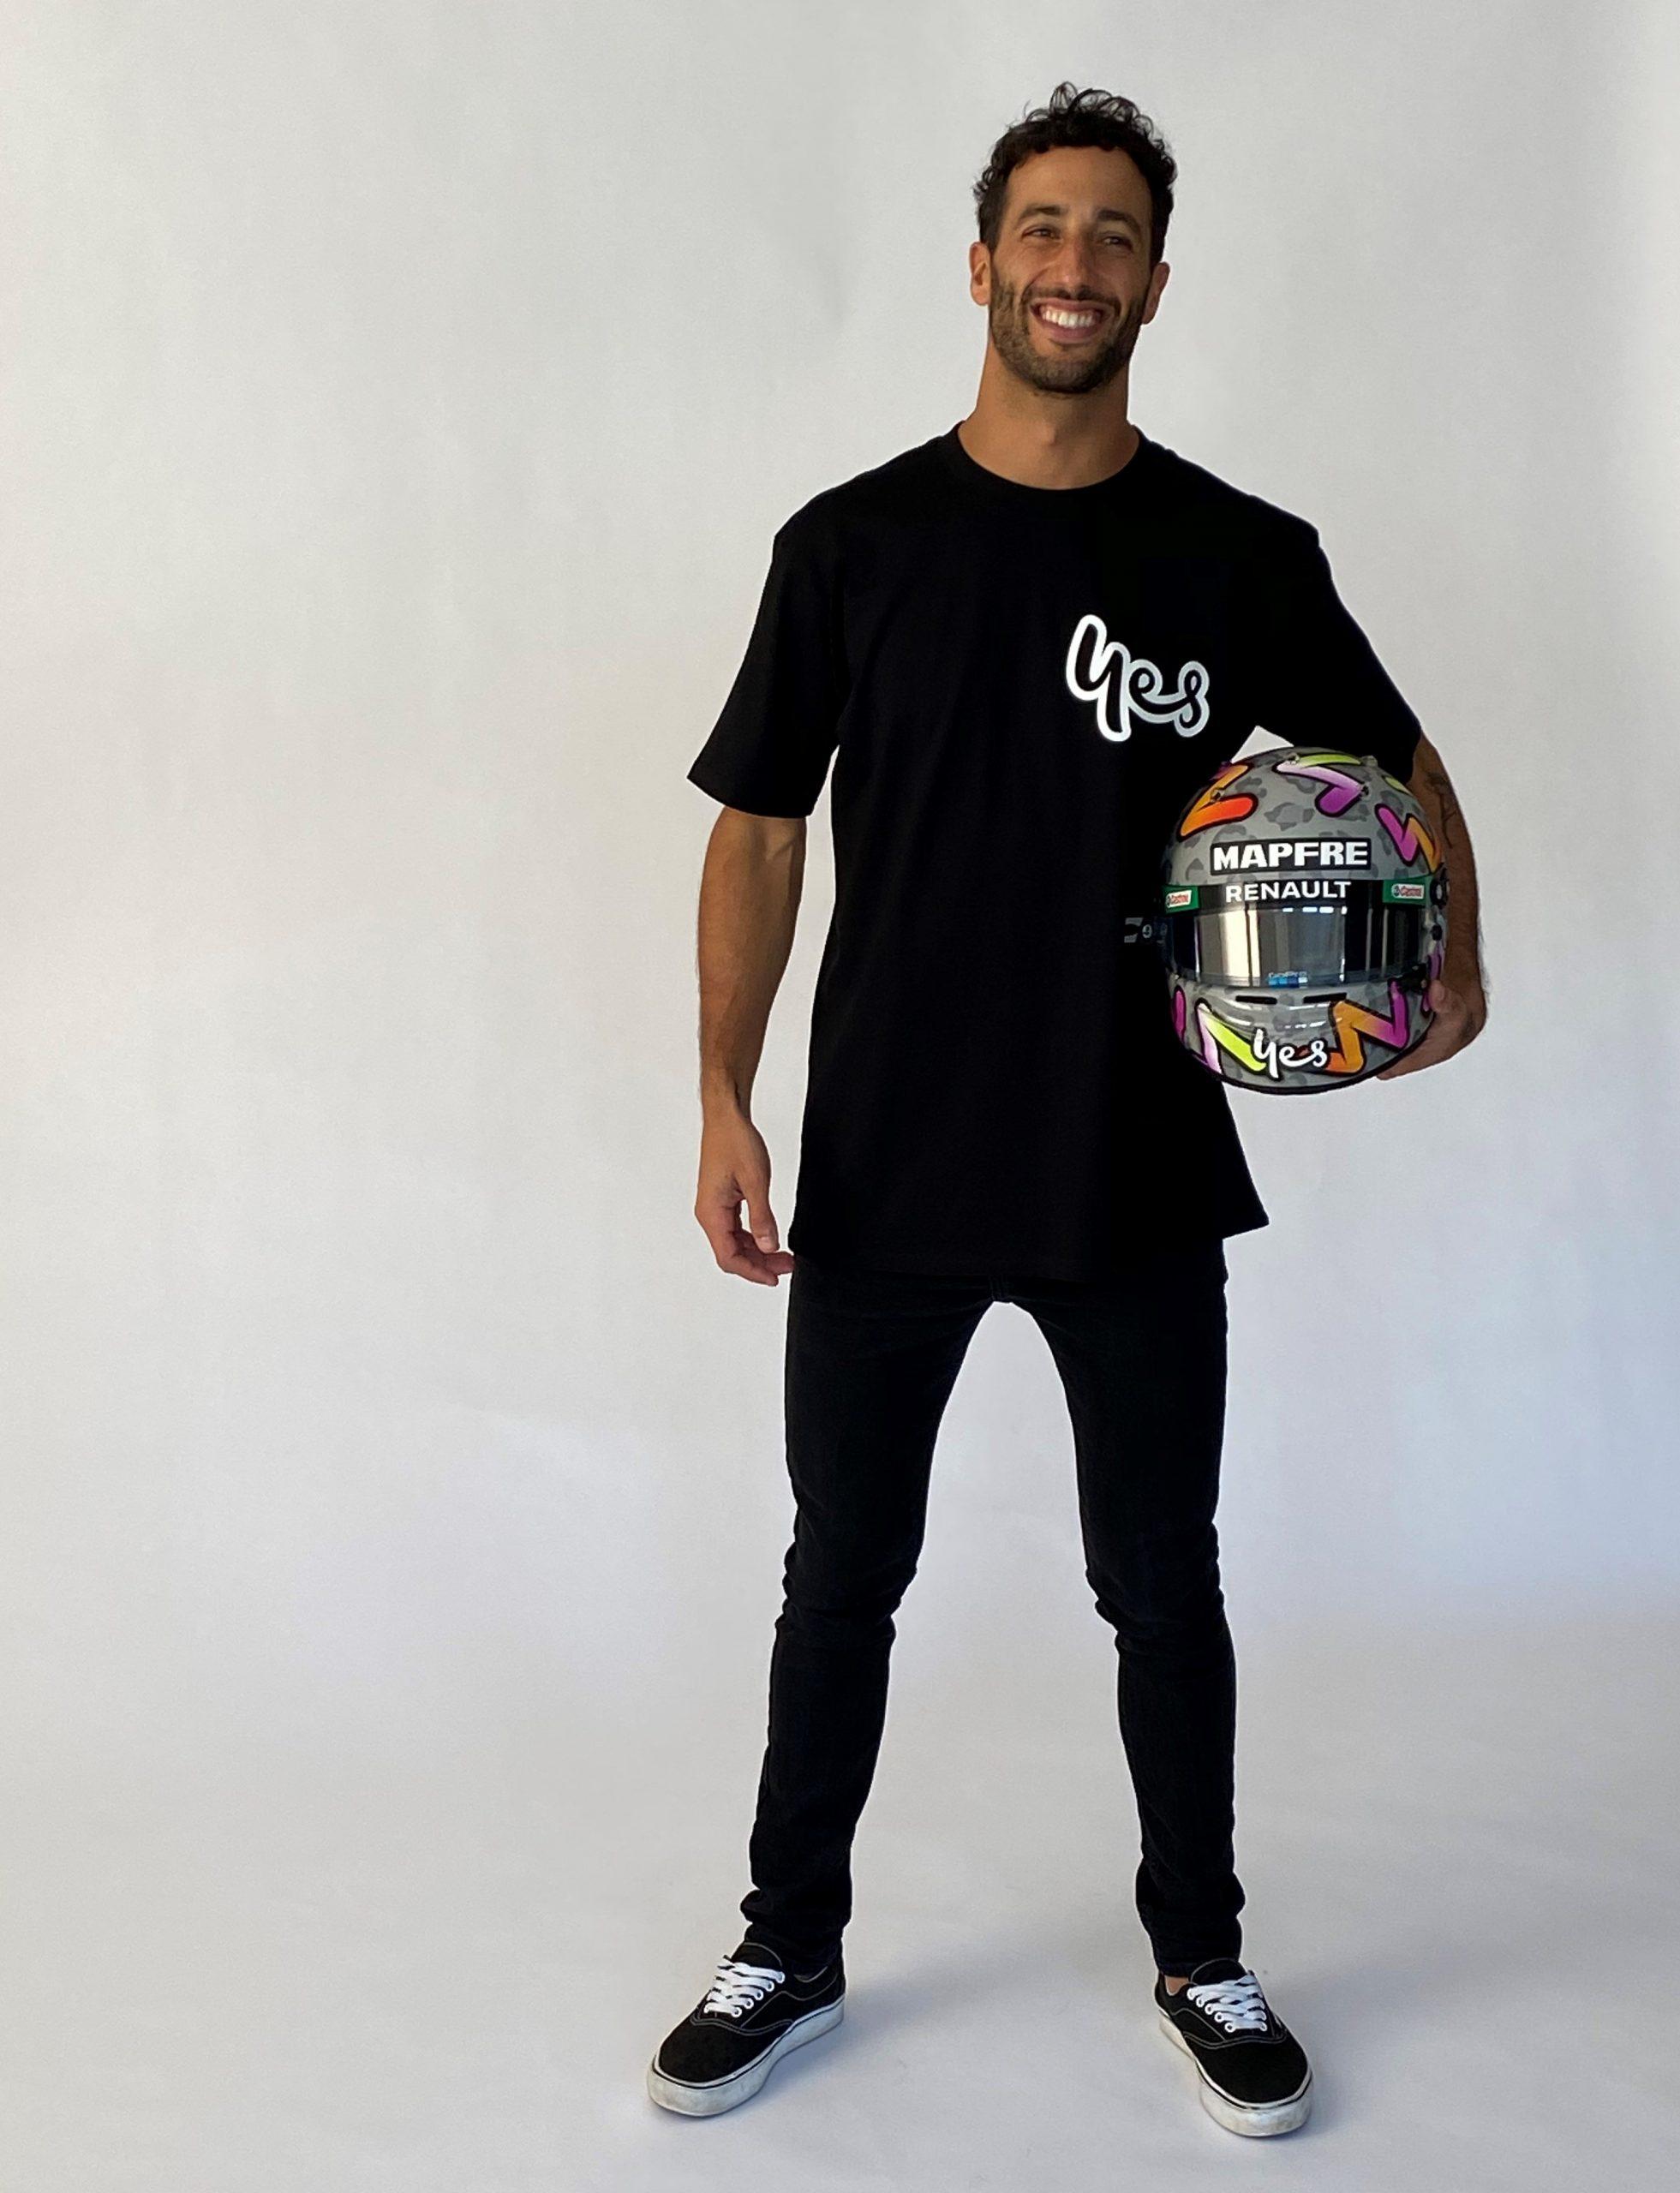 Australian Formula 1 Sensation Daniel Ricciardo Joins Optus In Fresh Partnership